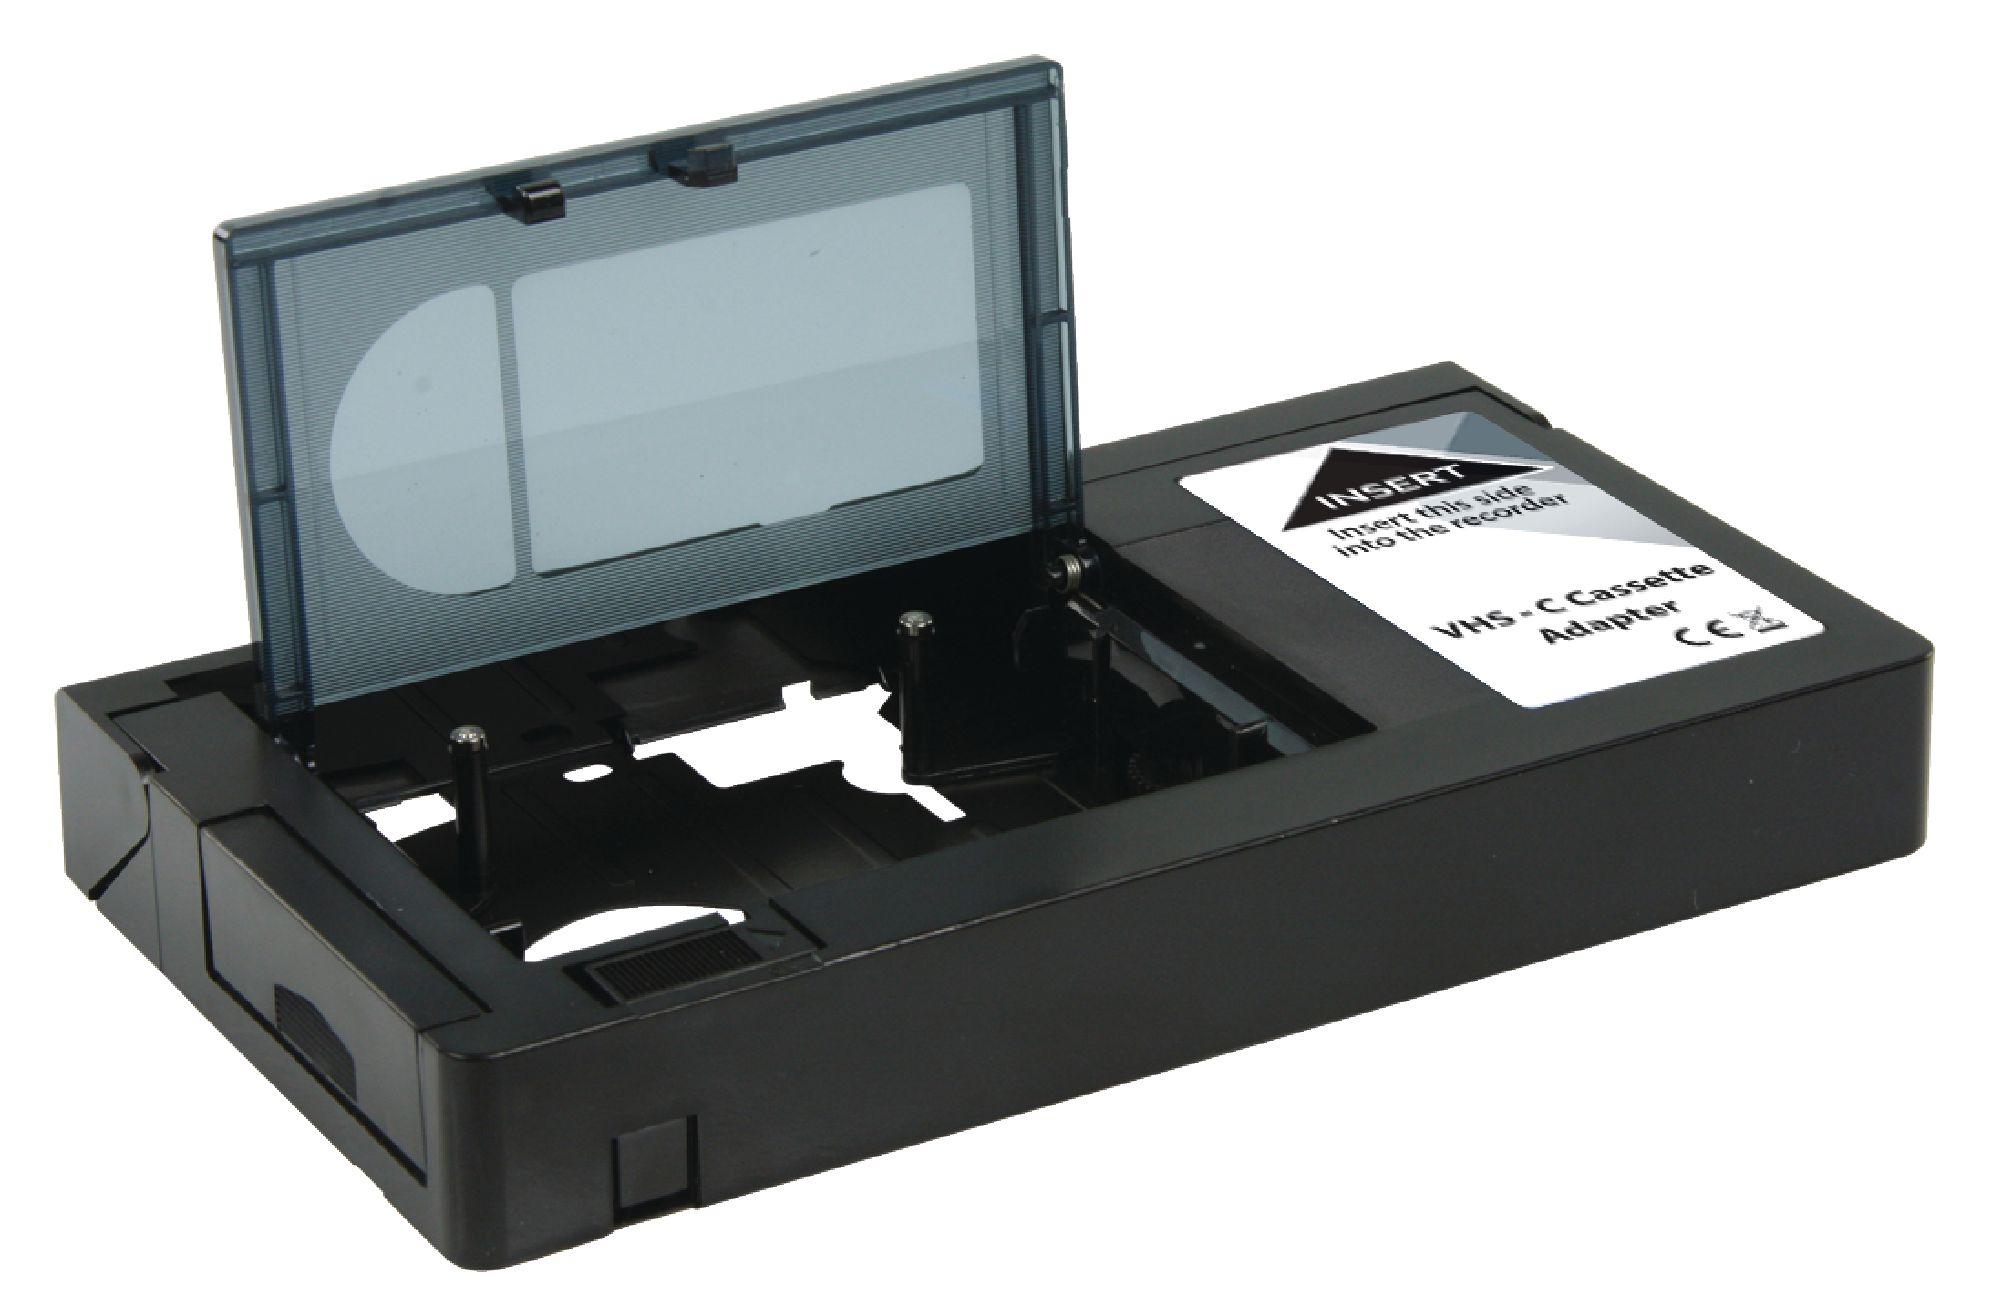 Konig Motorizados Cassette Adaptador Vhs C A Vhs Adaptador Ebay